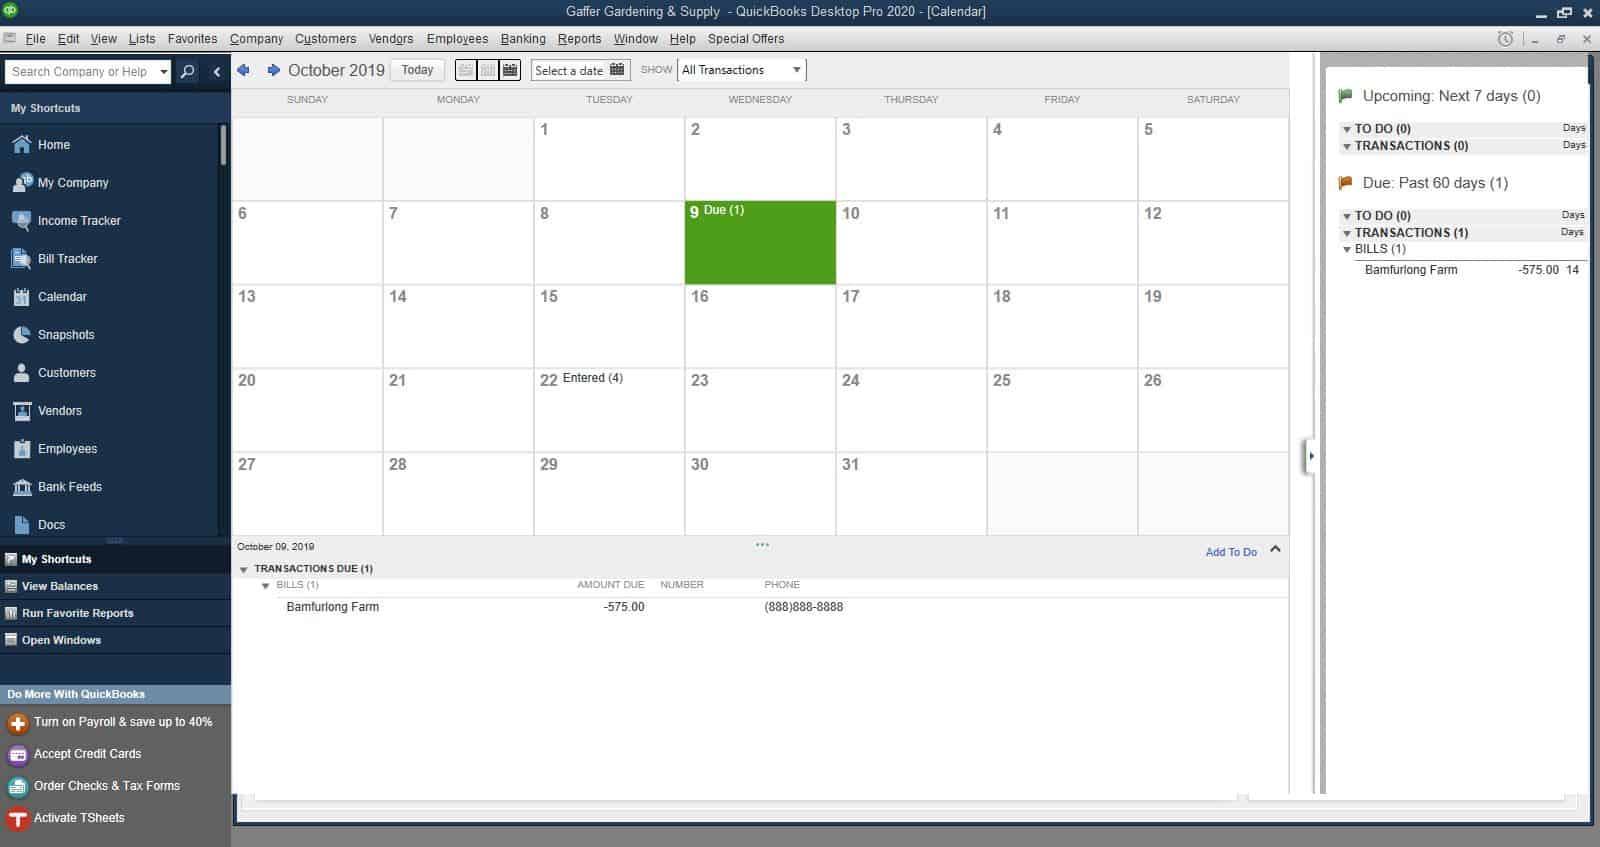 QuickBooks Desktop Pro 2020 Calendar